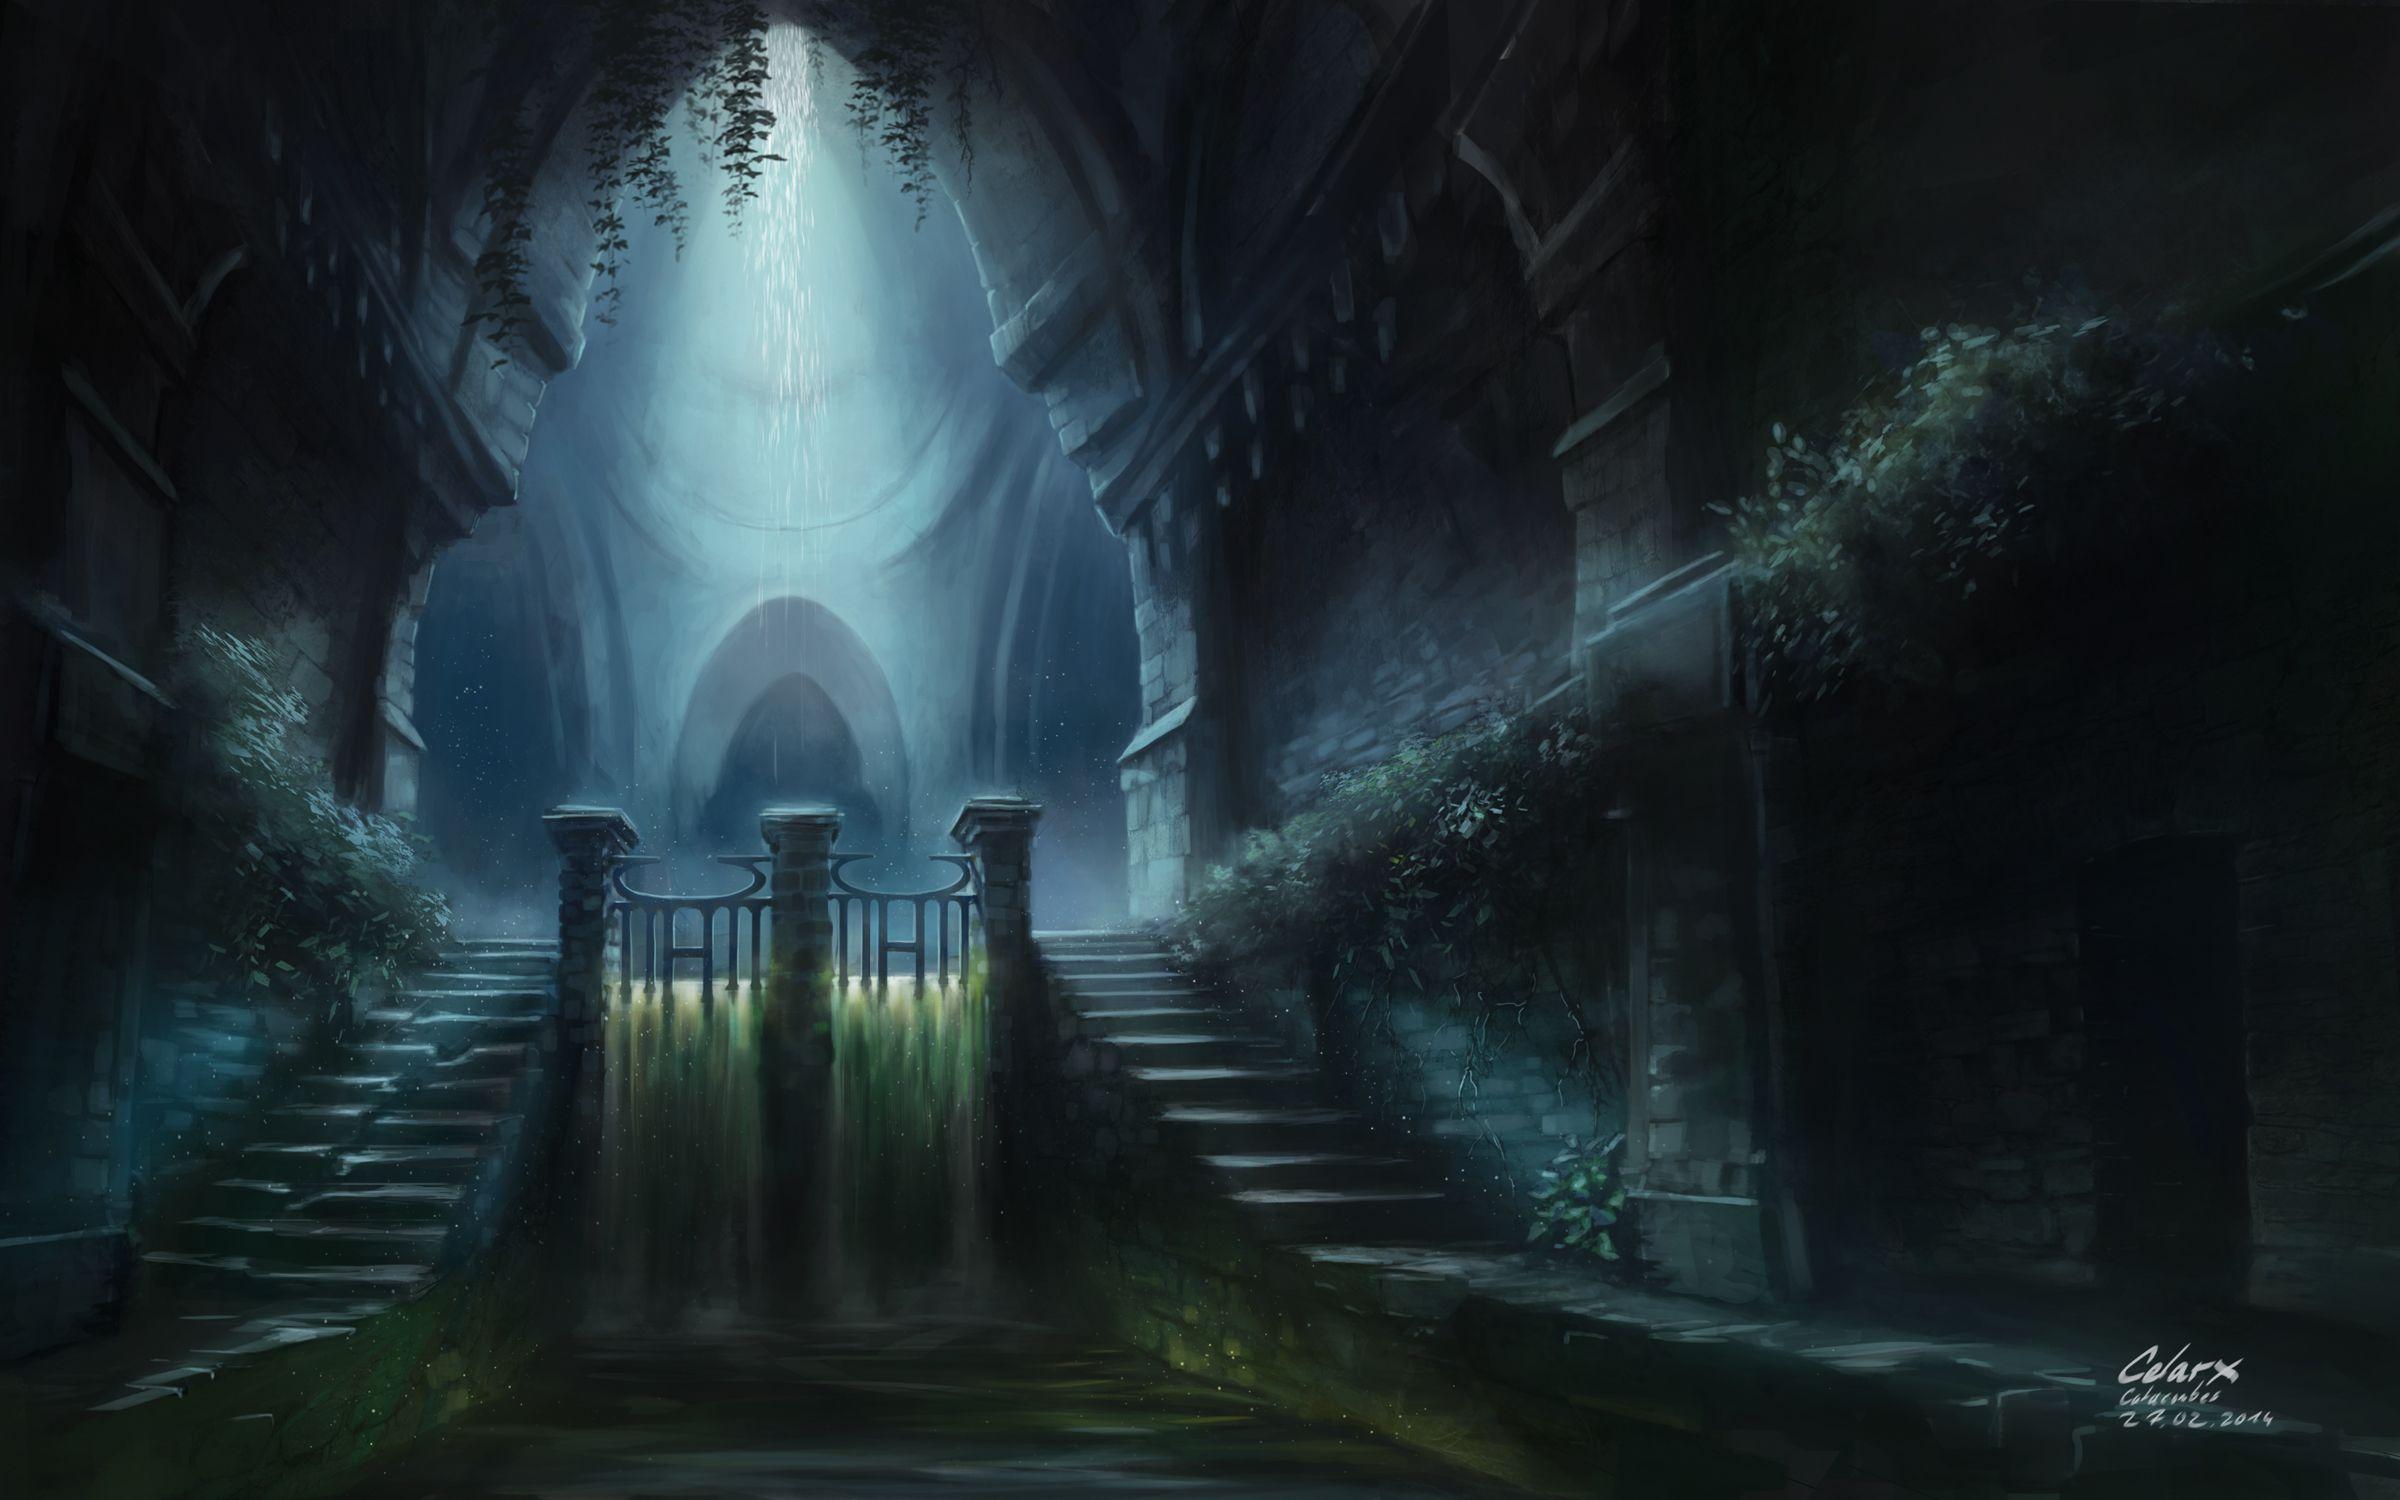 Flooded Catacombs by Celarx.deviantart.com on @DeviantArt ...